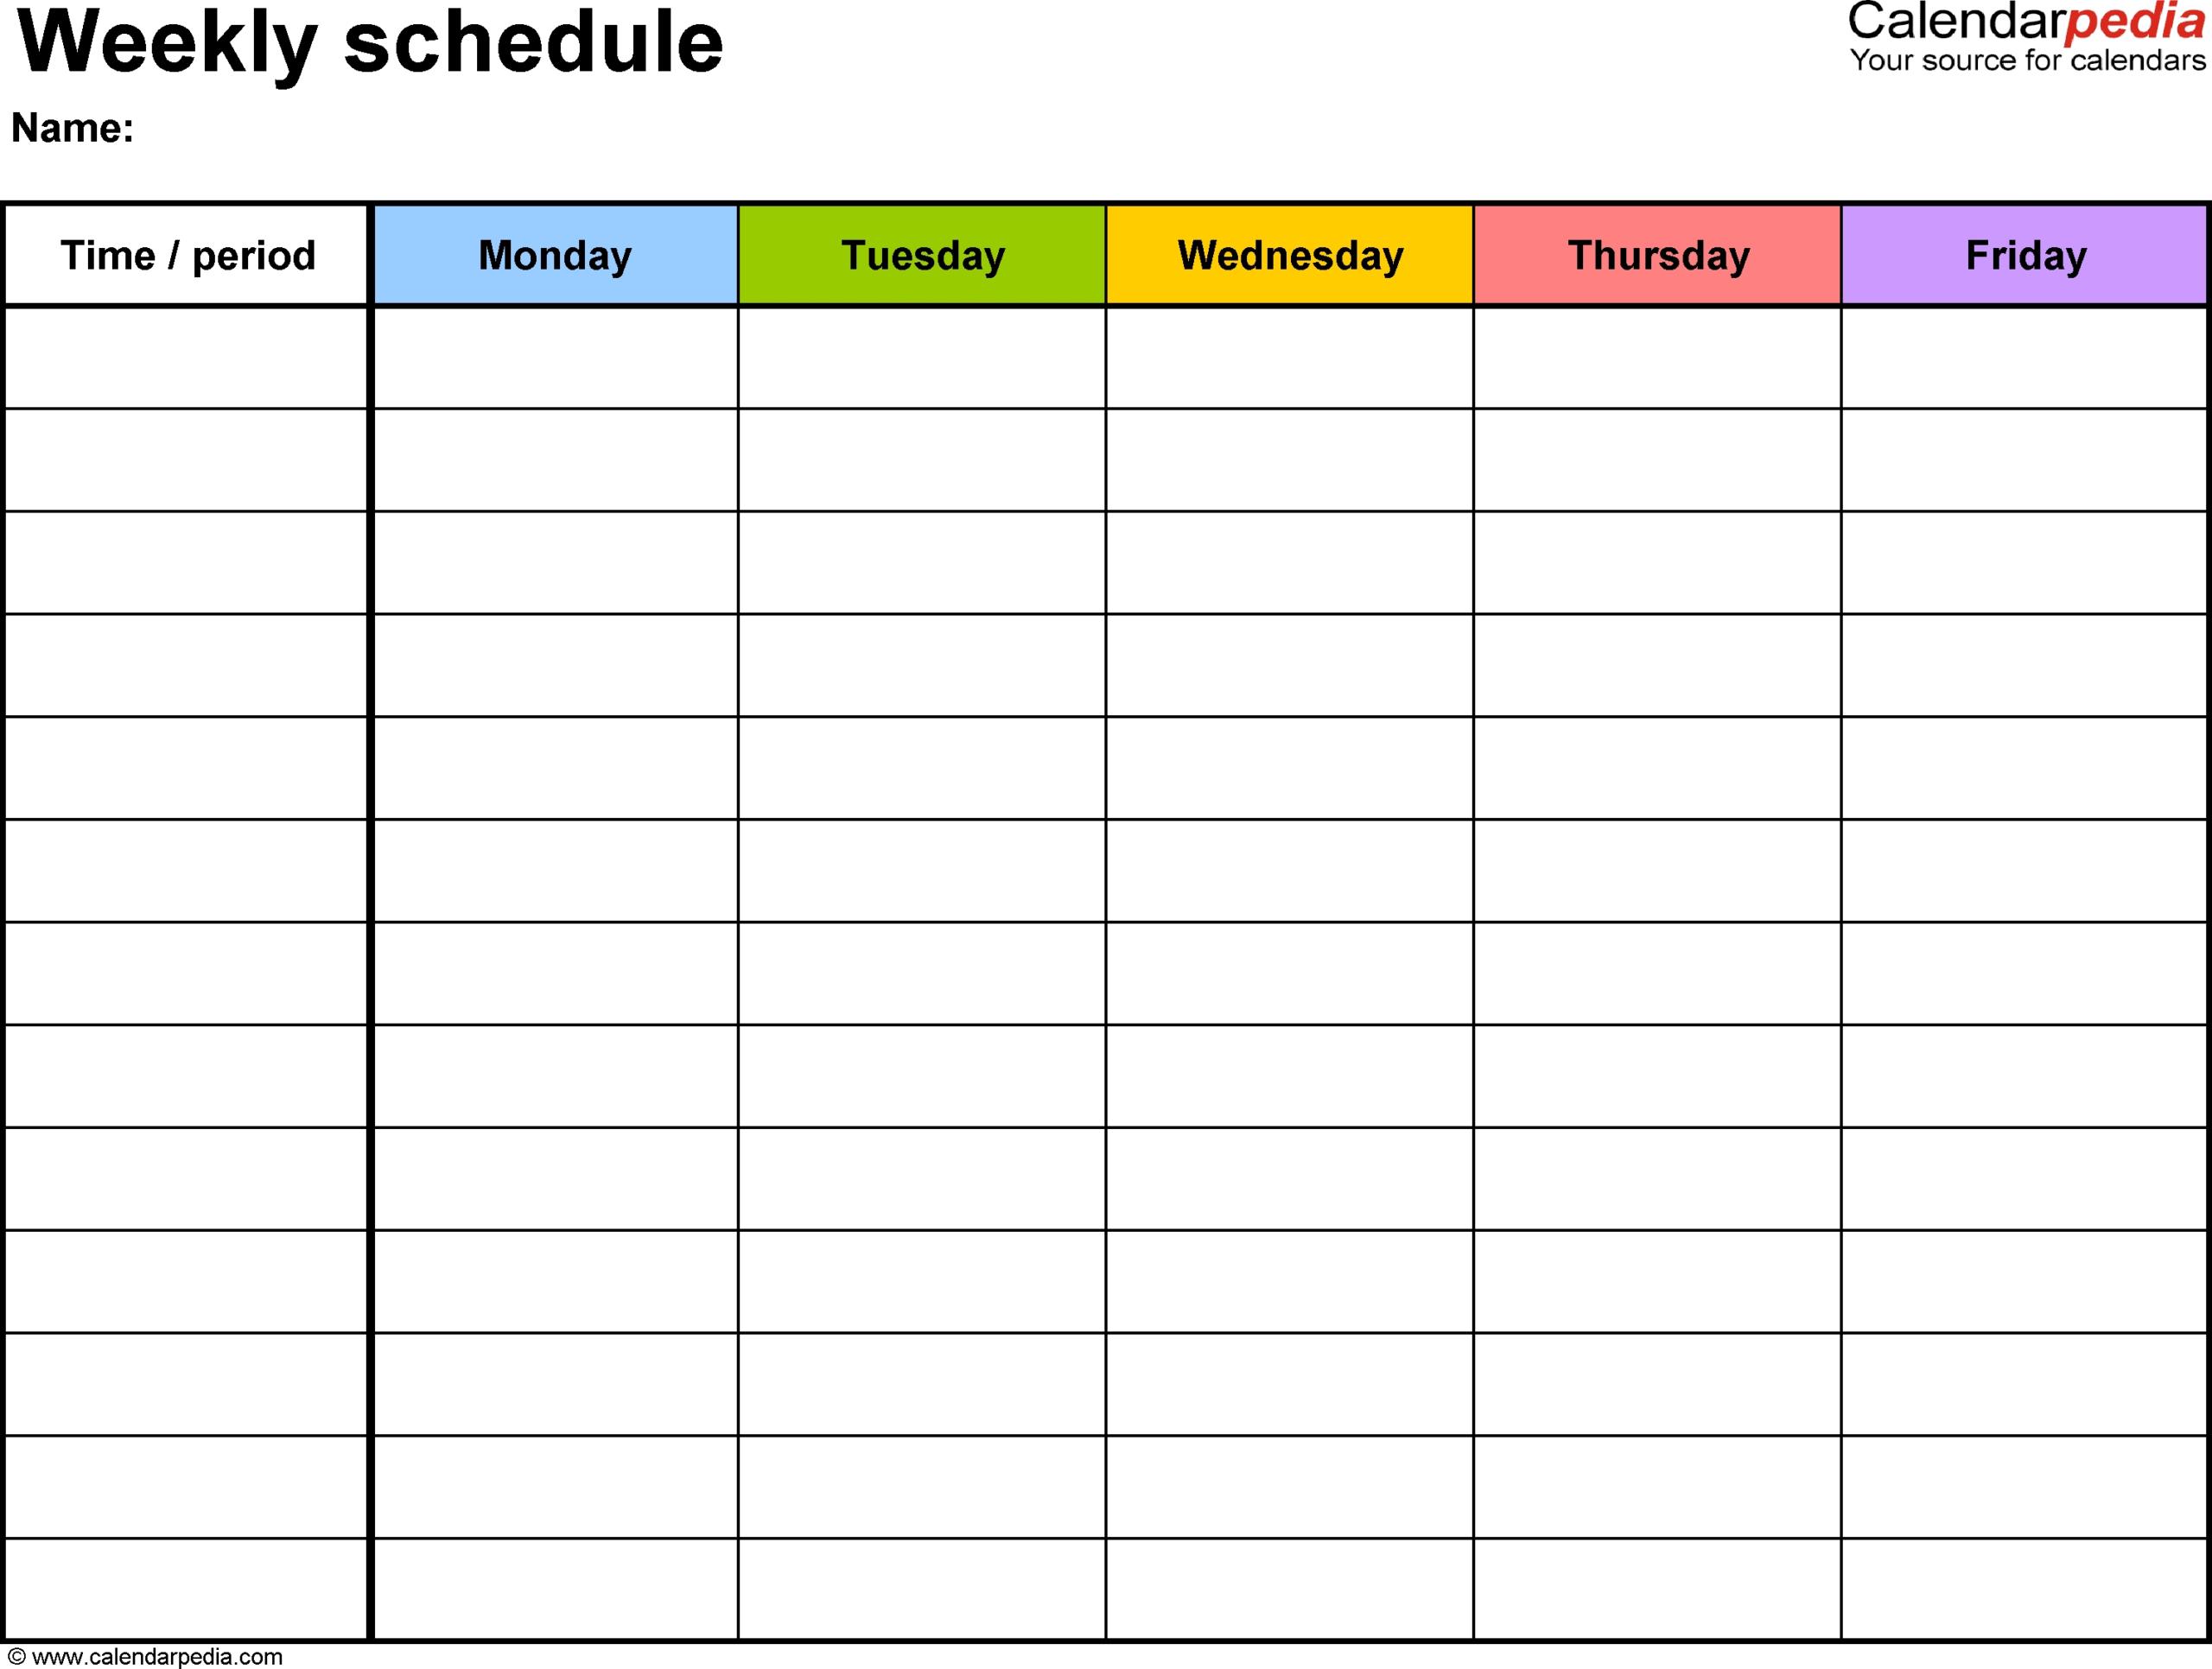 Pdf Daily Calendar With Time Slots  Calendar Inspiration within Calendar Template With Time Slots